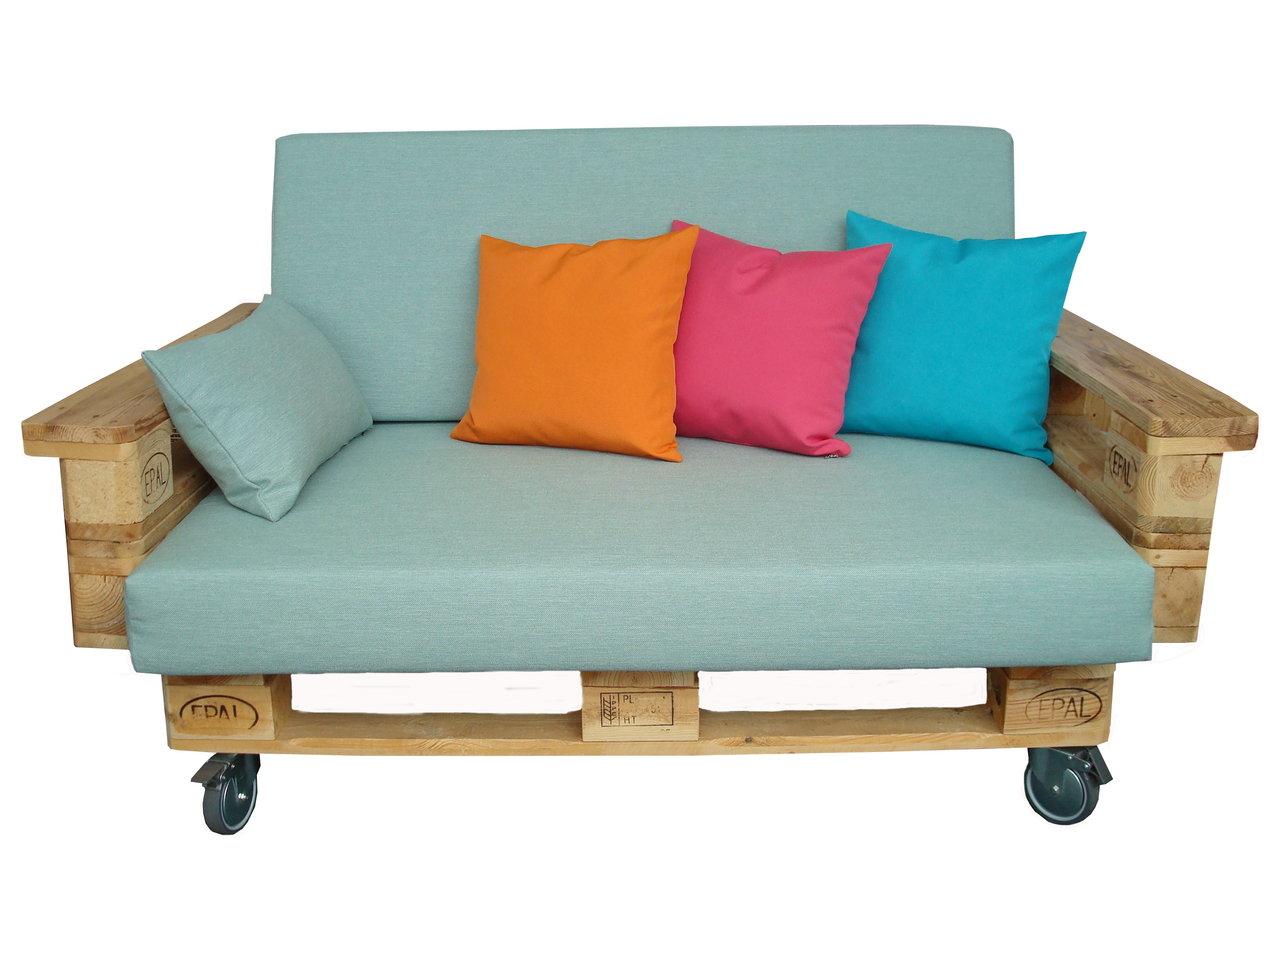 paletten polster set 1 bequemer sitzen. Black Bedroom Furniture Sets. Home Design Ideas